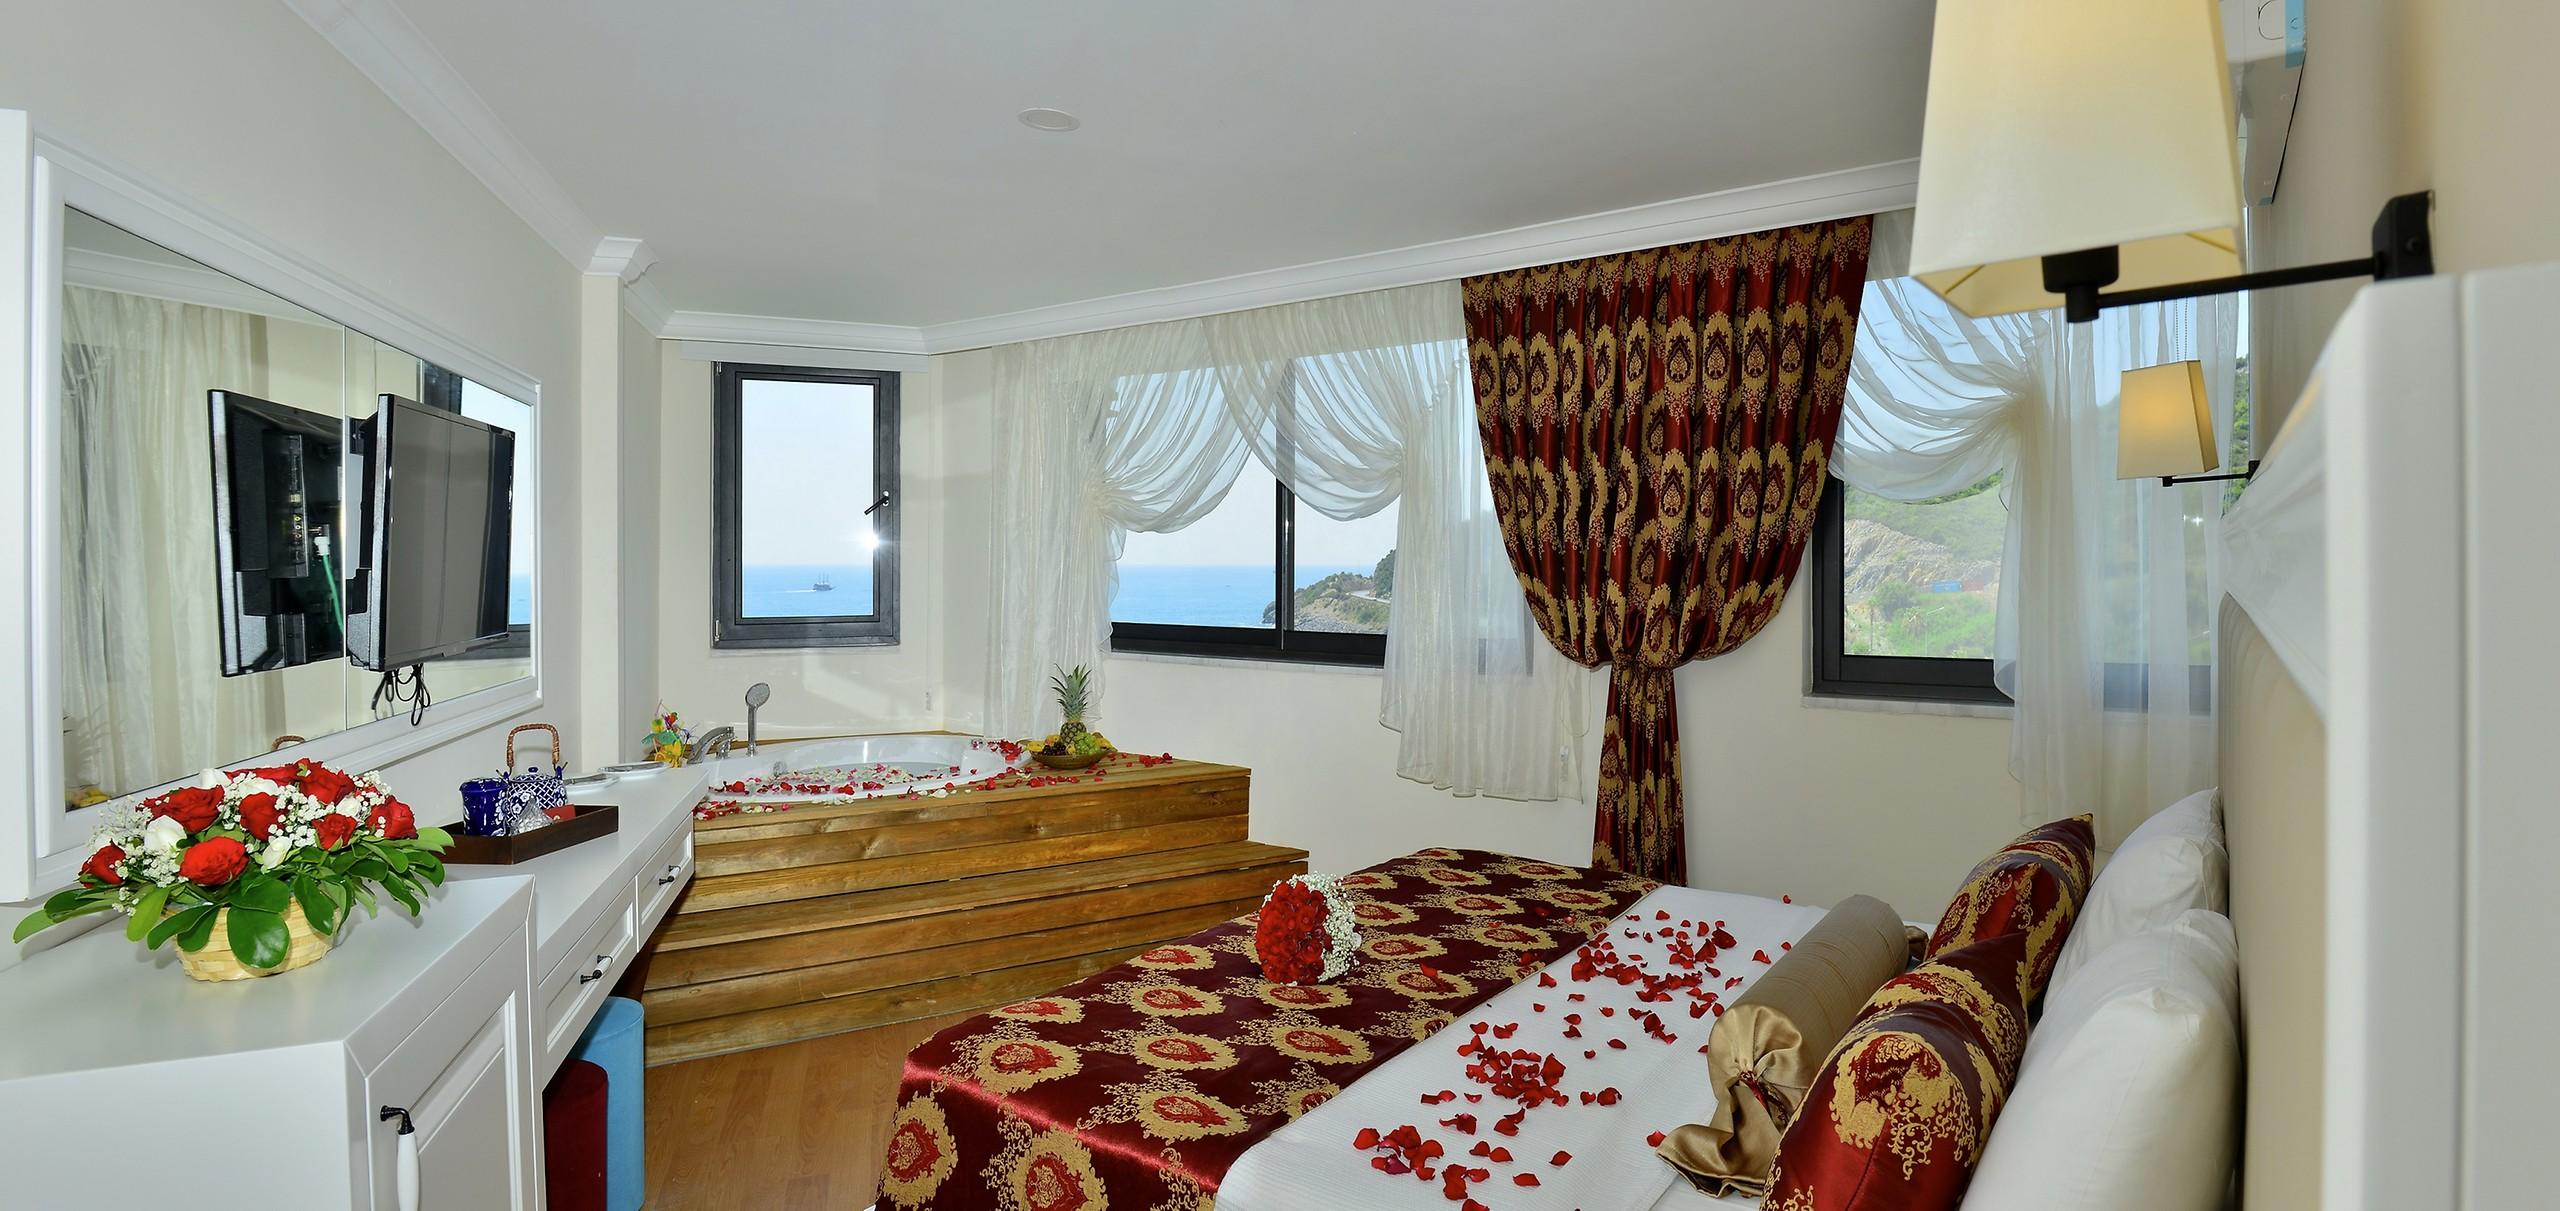 SEA STAR HOTEL261943